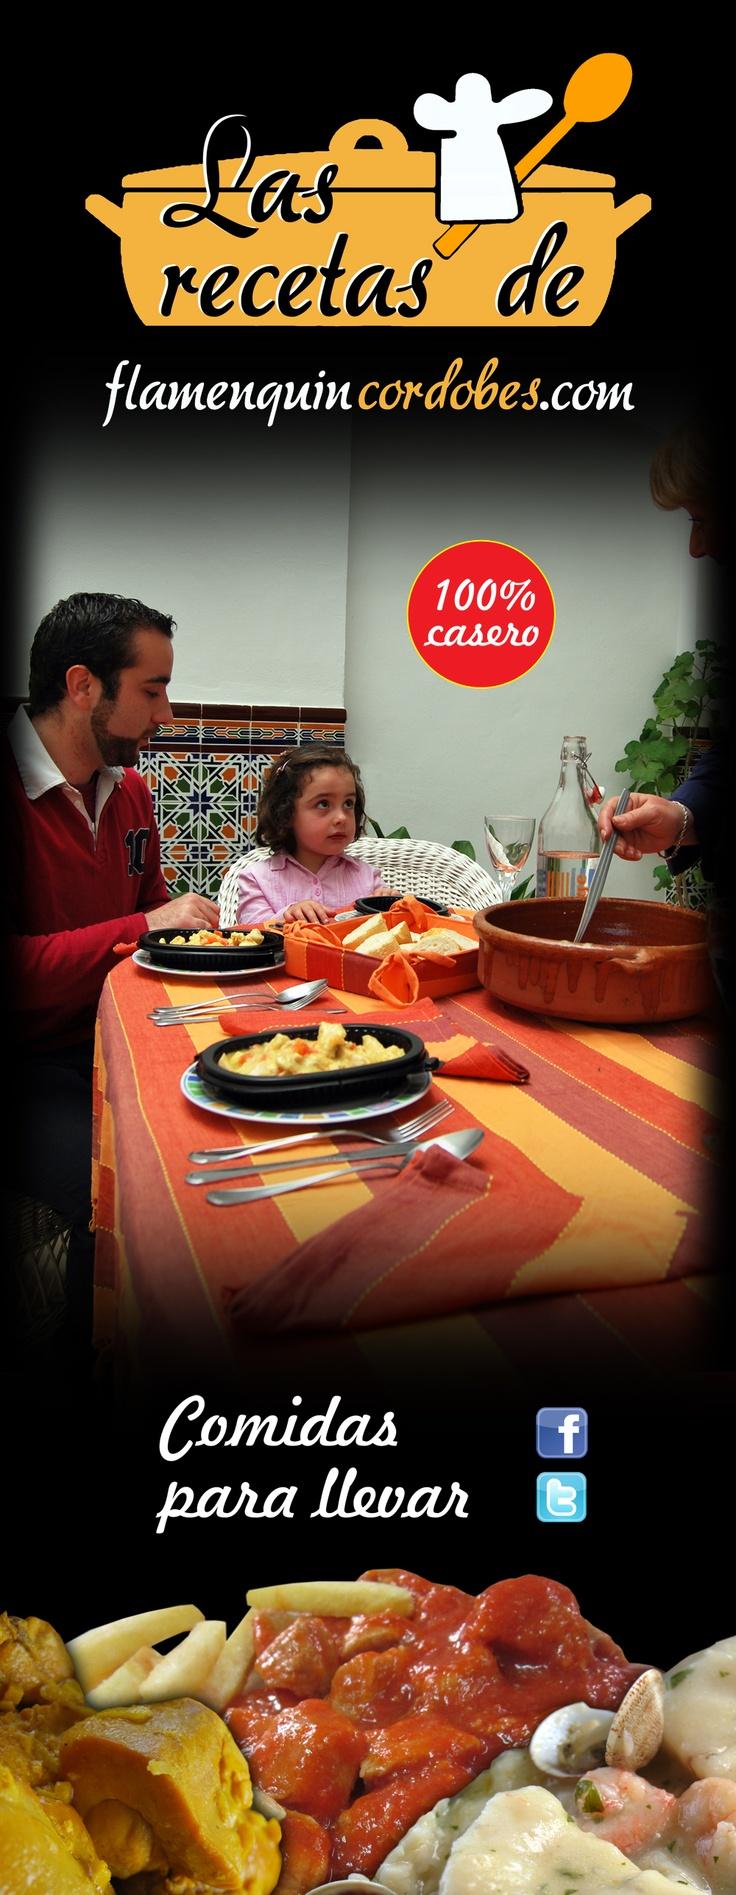 Cartel promocional de 'Las recetas de flamenquincordobes.com'